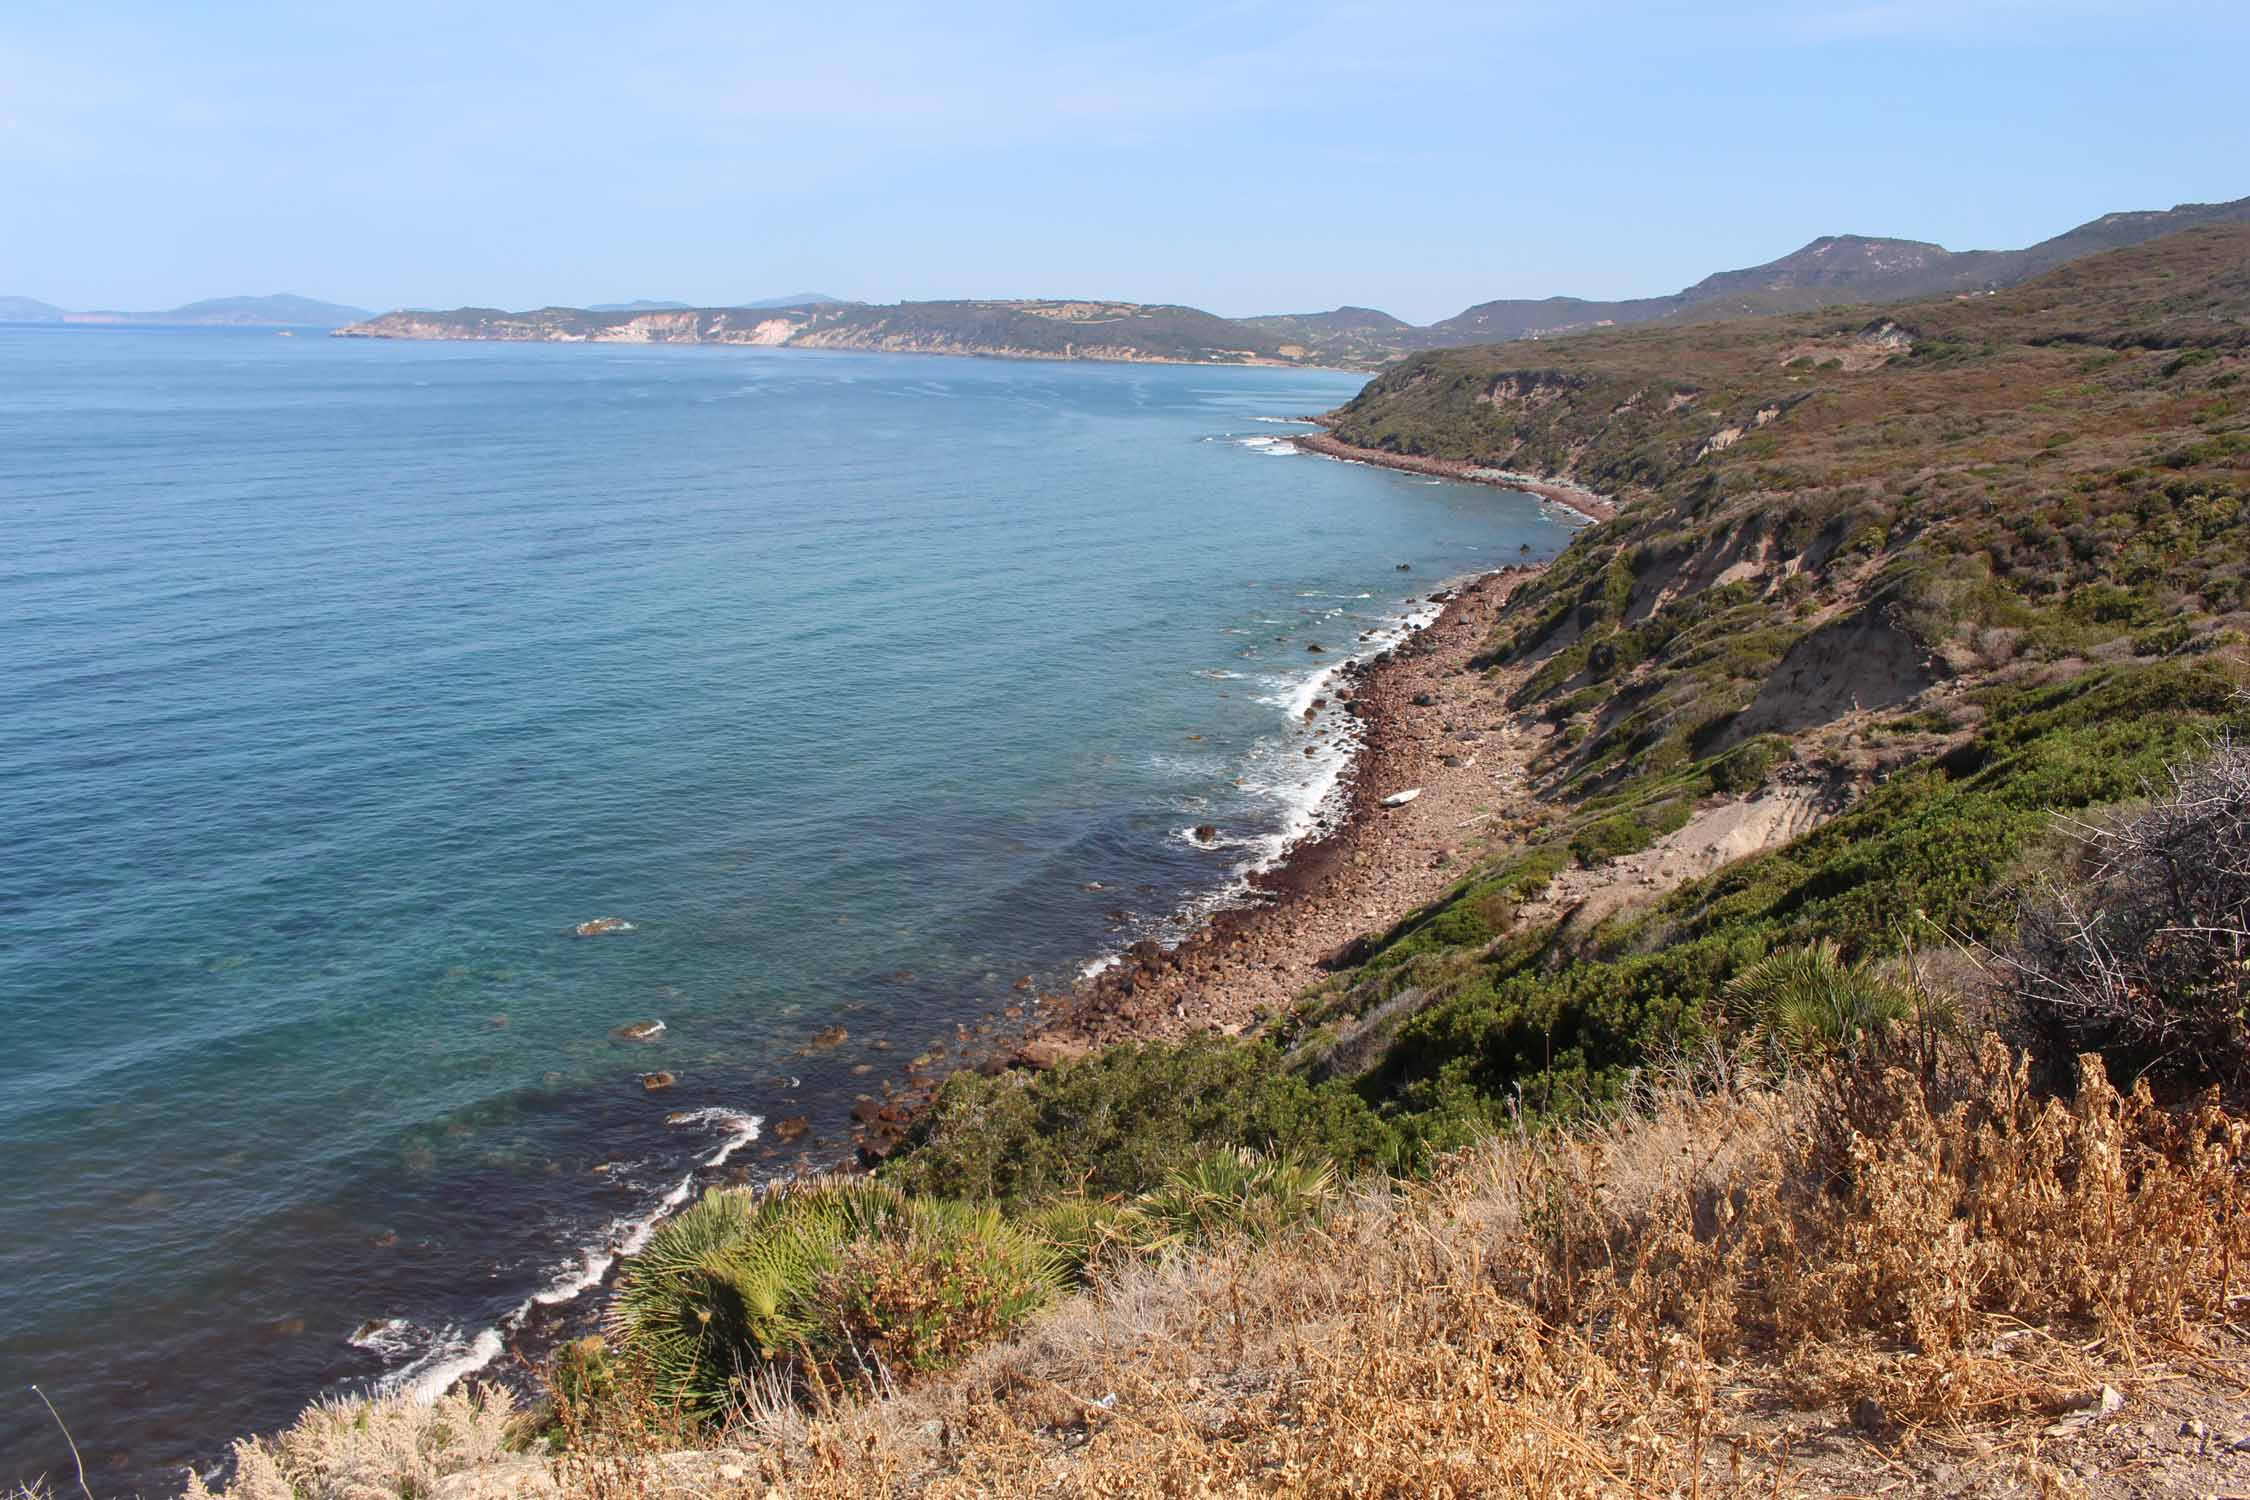 Ruta Alghero - Bosa